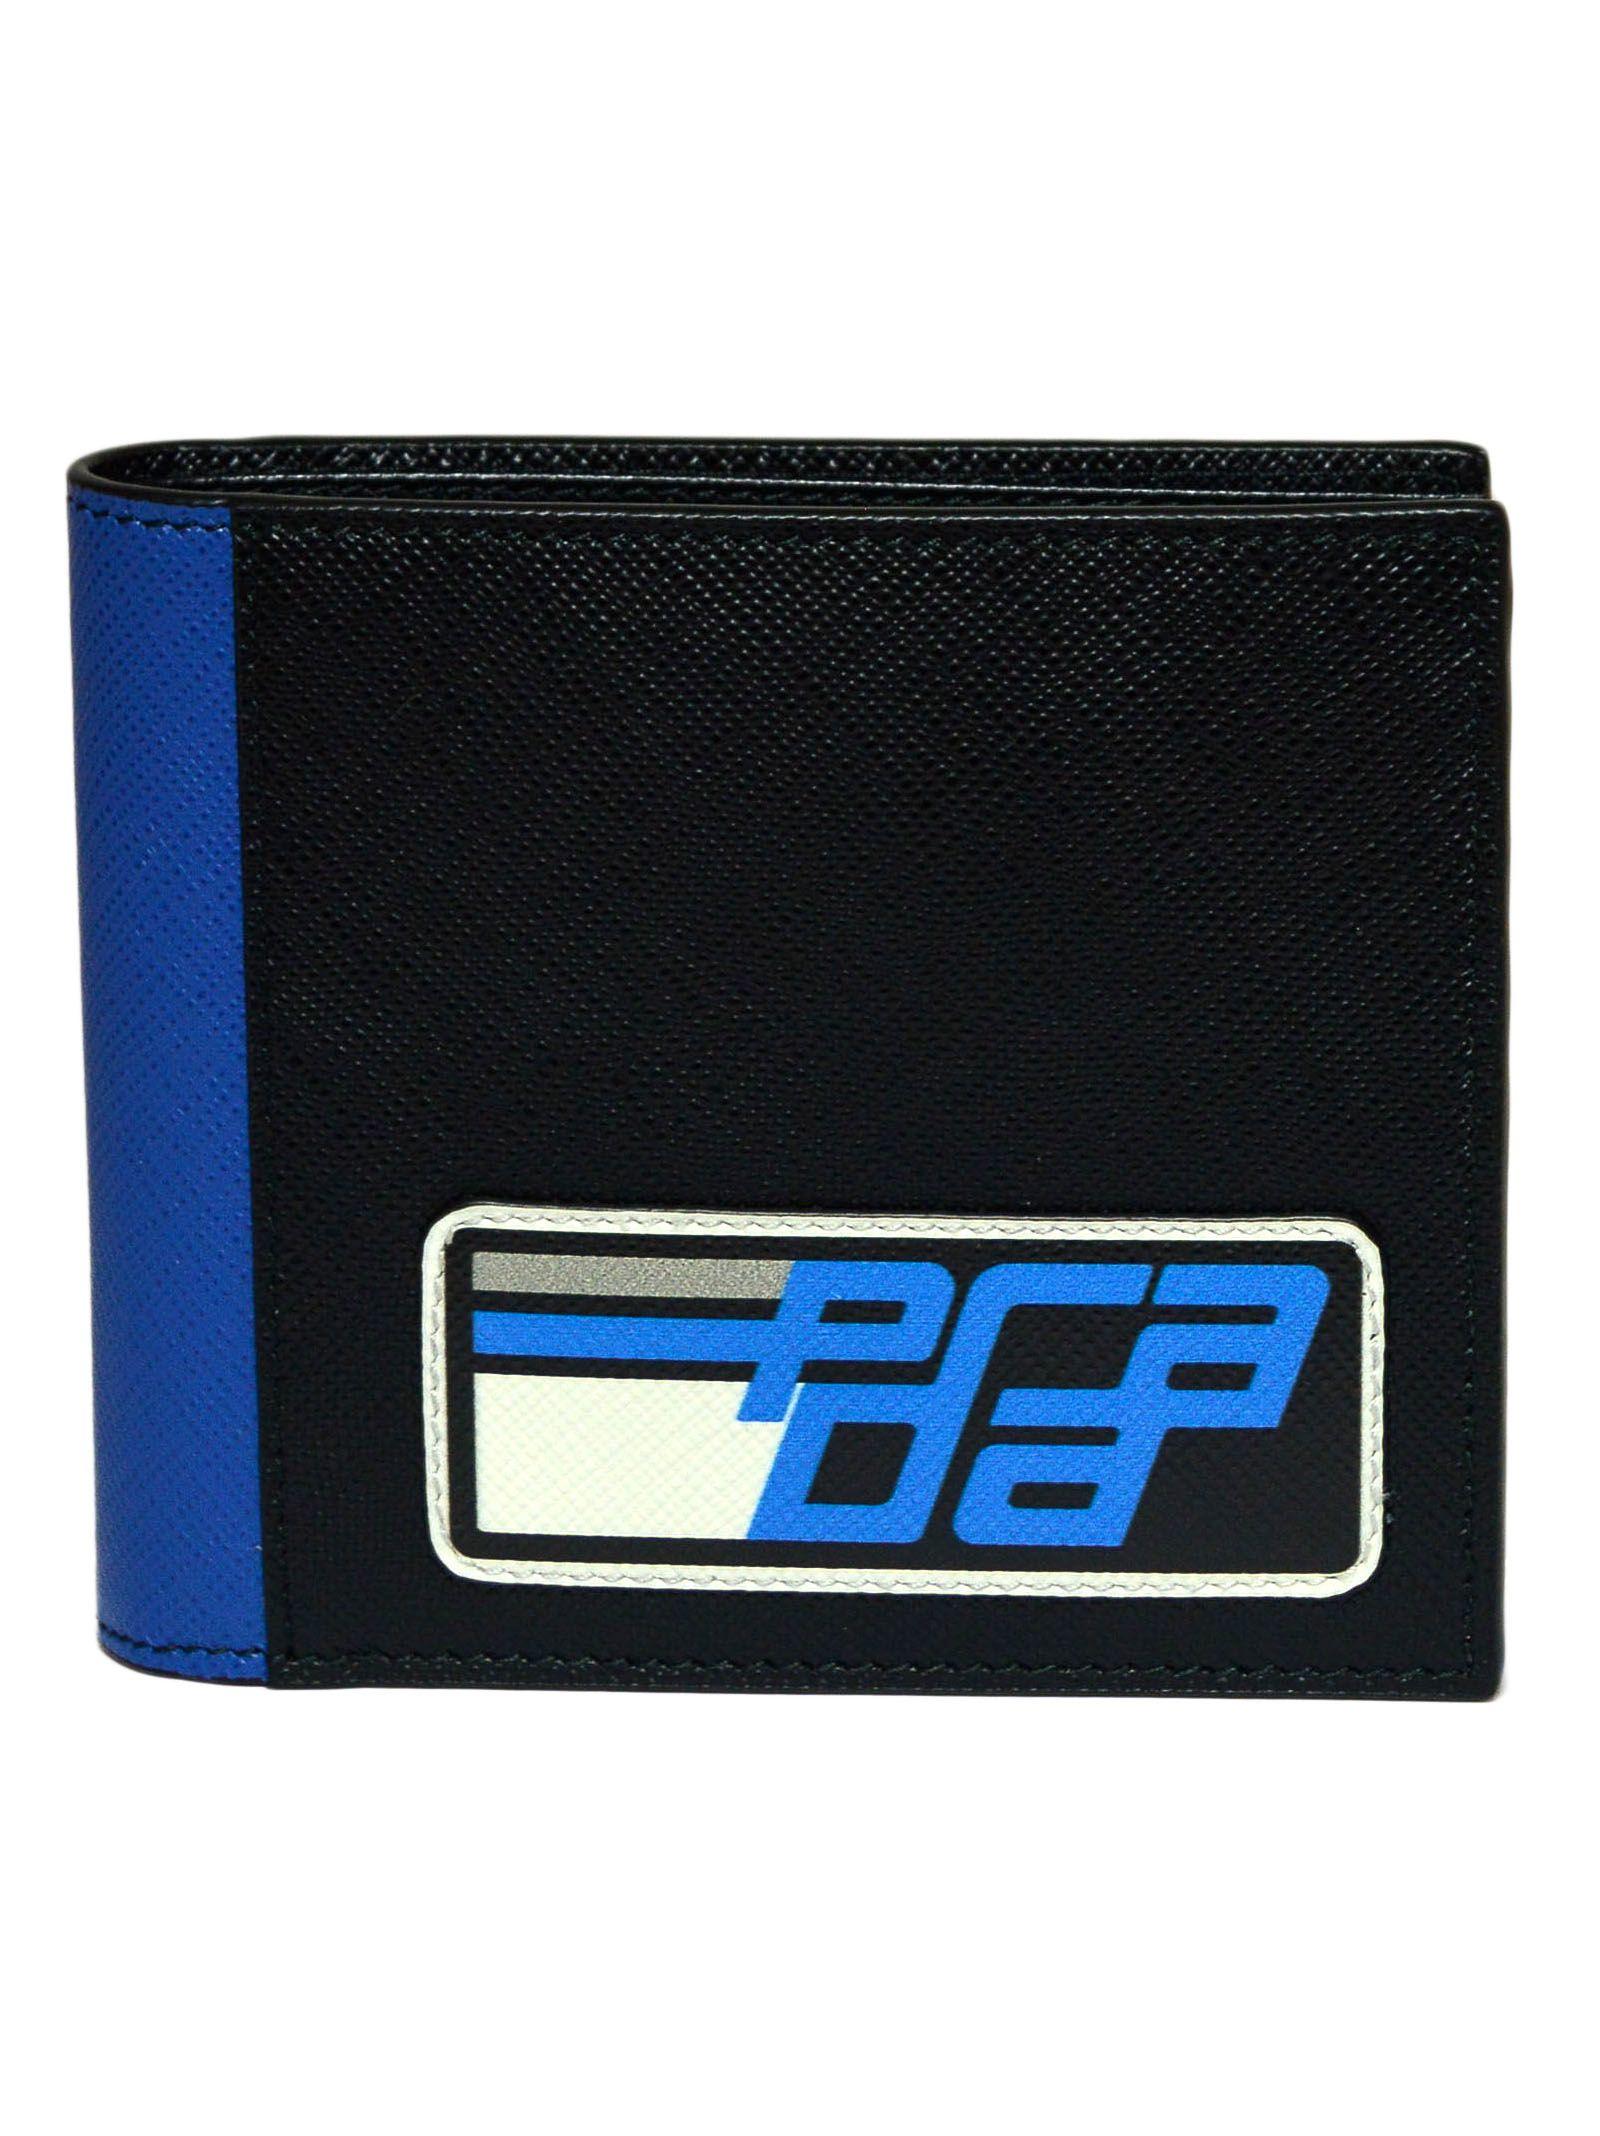 fa0027689d06 Prada Prada Logo Print Bi-fold Wallet - B Black Light Blue ...